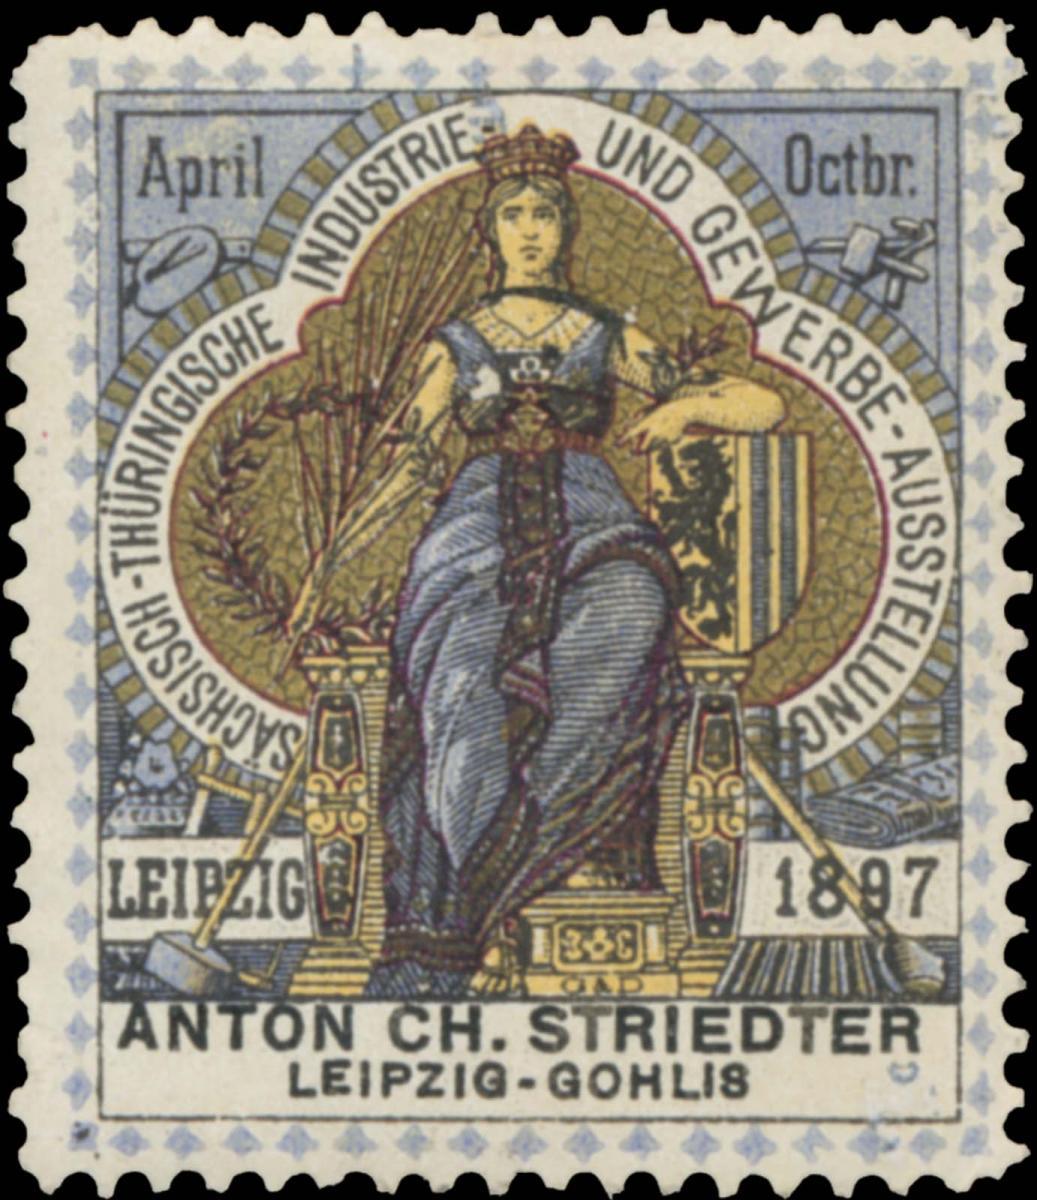 Anton Ch. Striedter